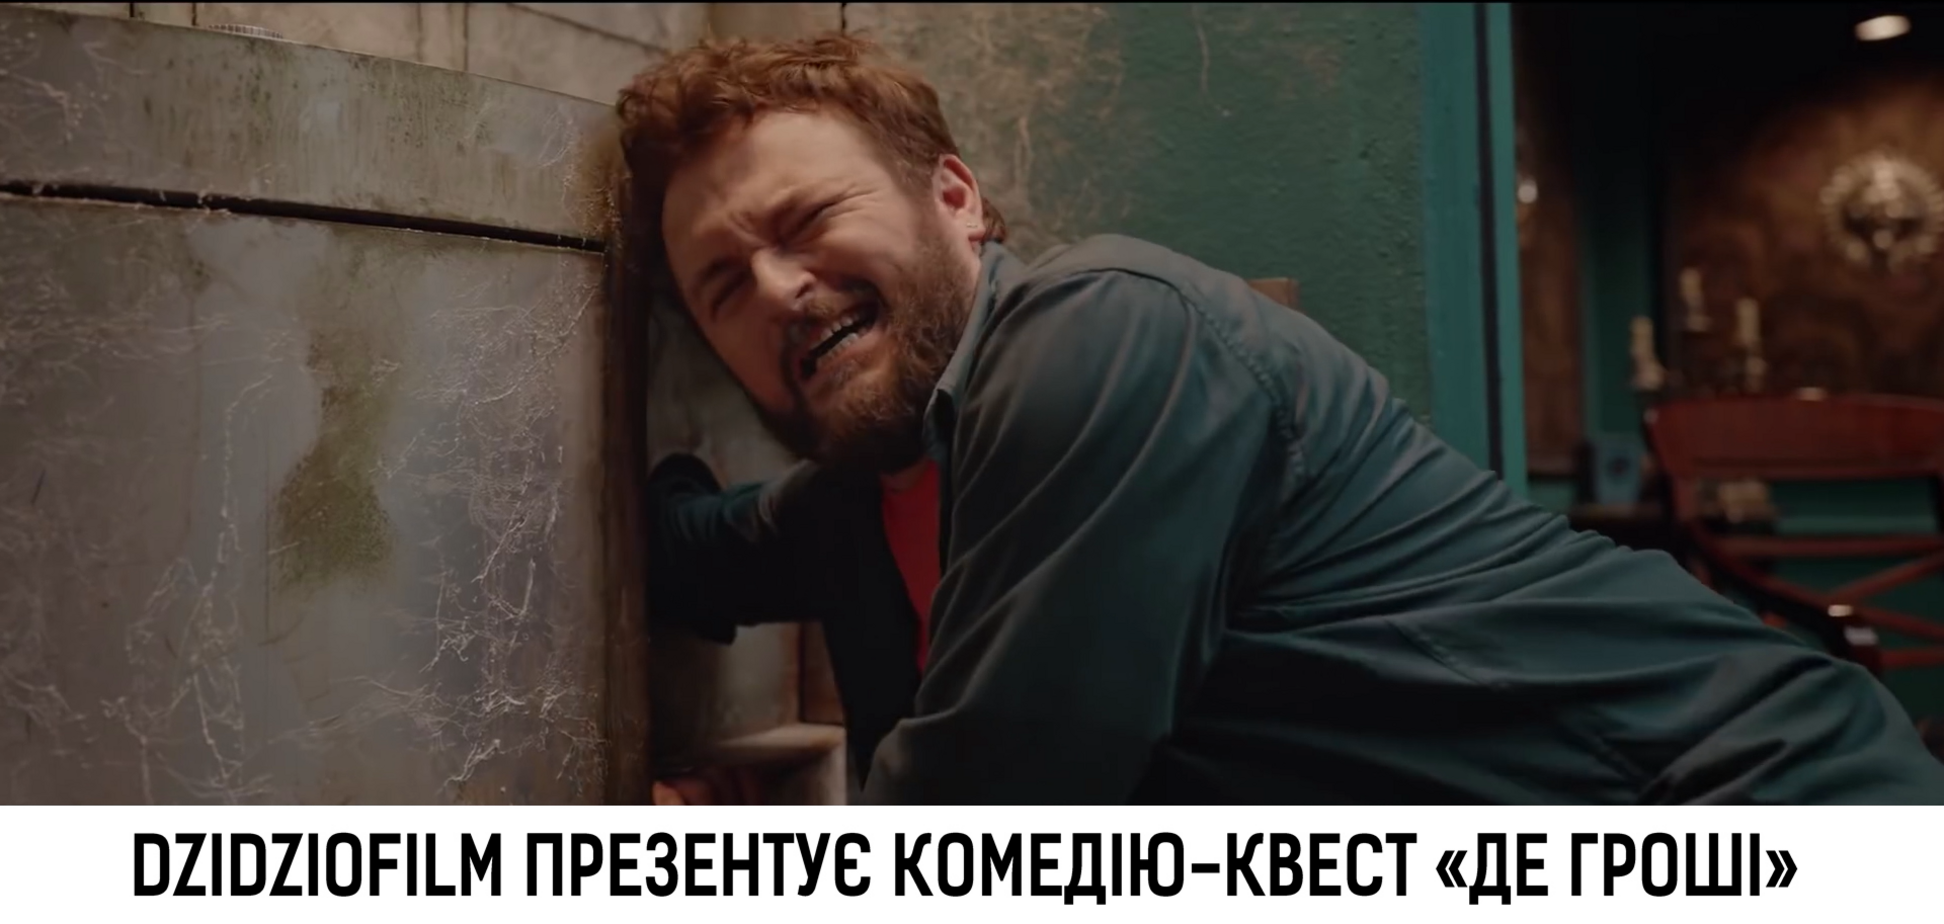 DZIDZIOFILM представляет комедию-квест 'ГДЕ ДЕНЬГИ'